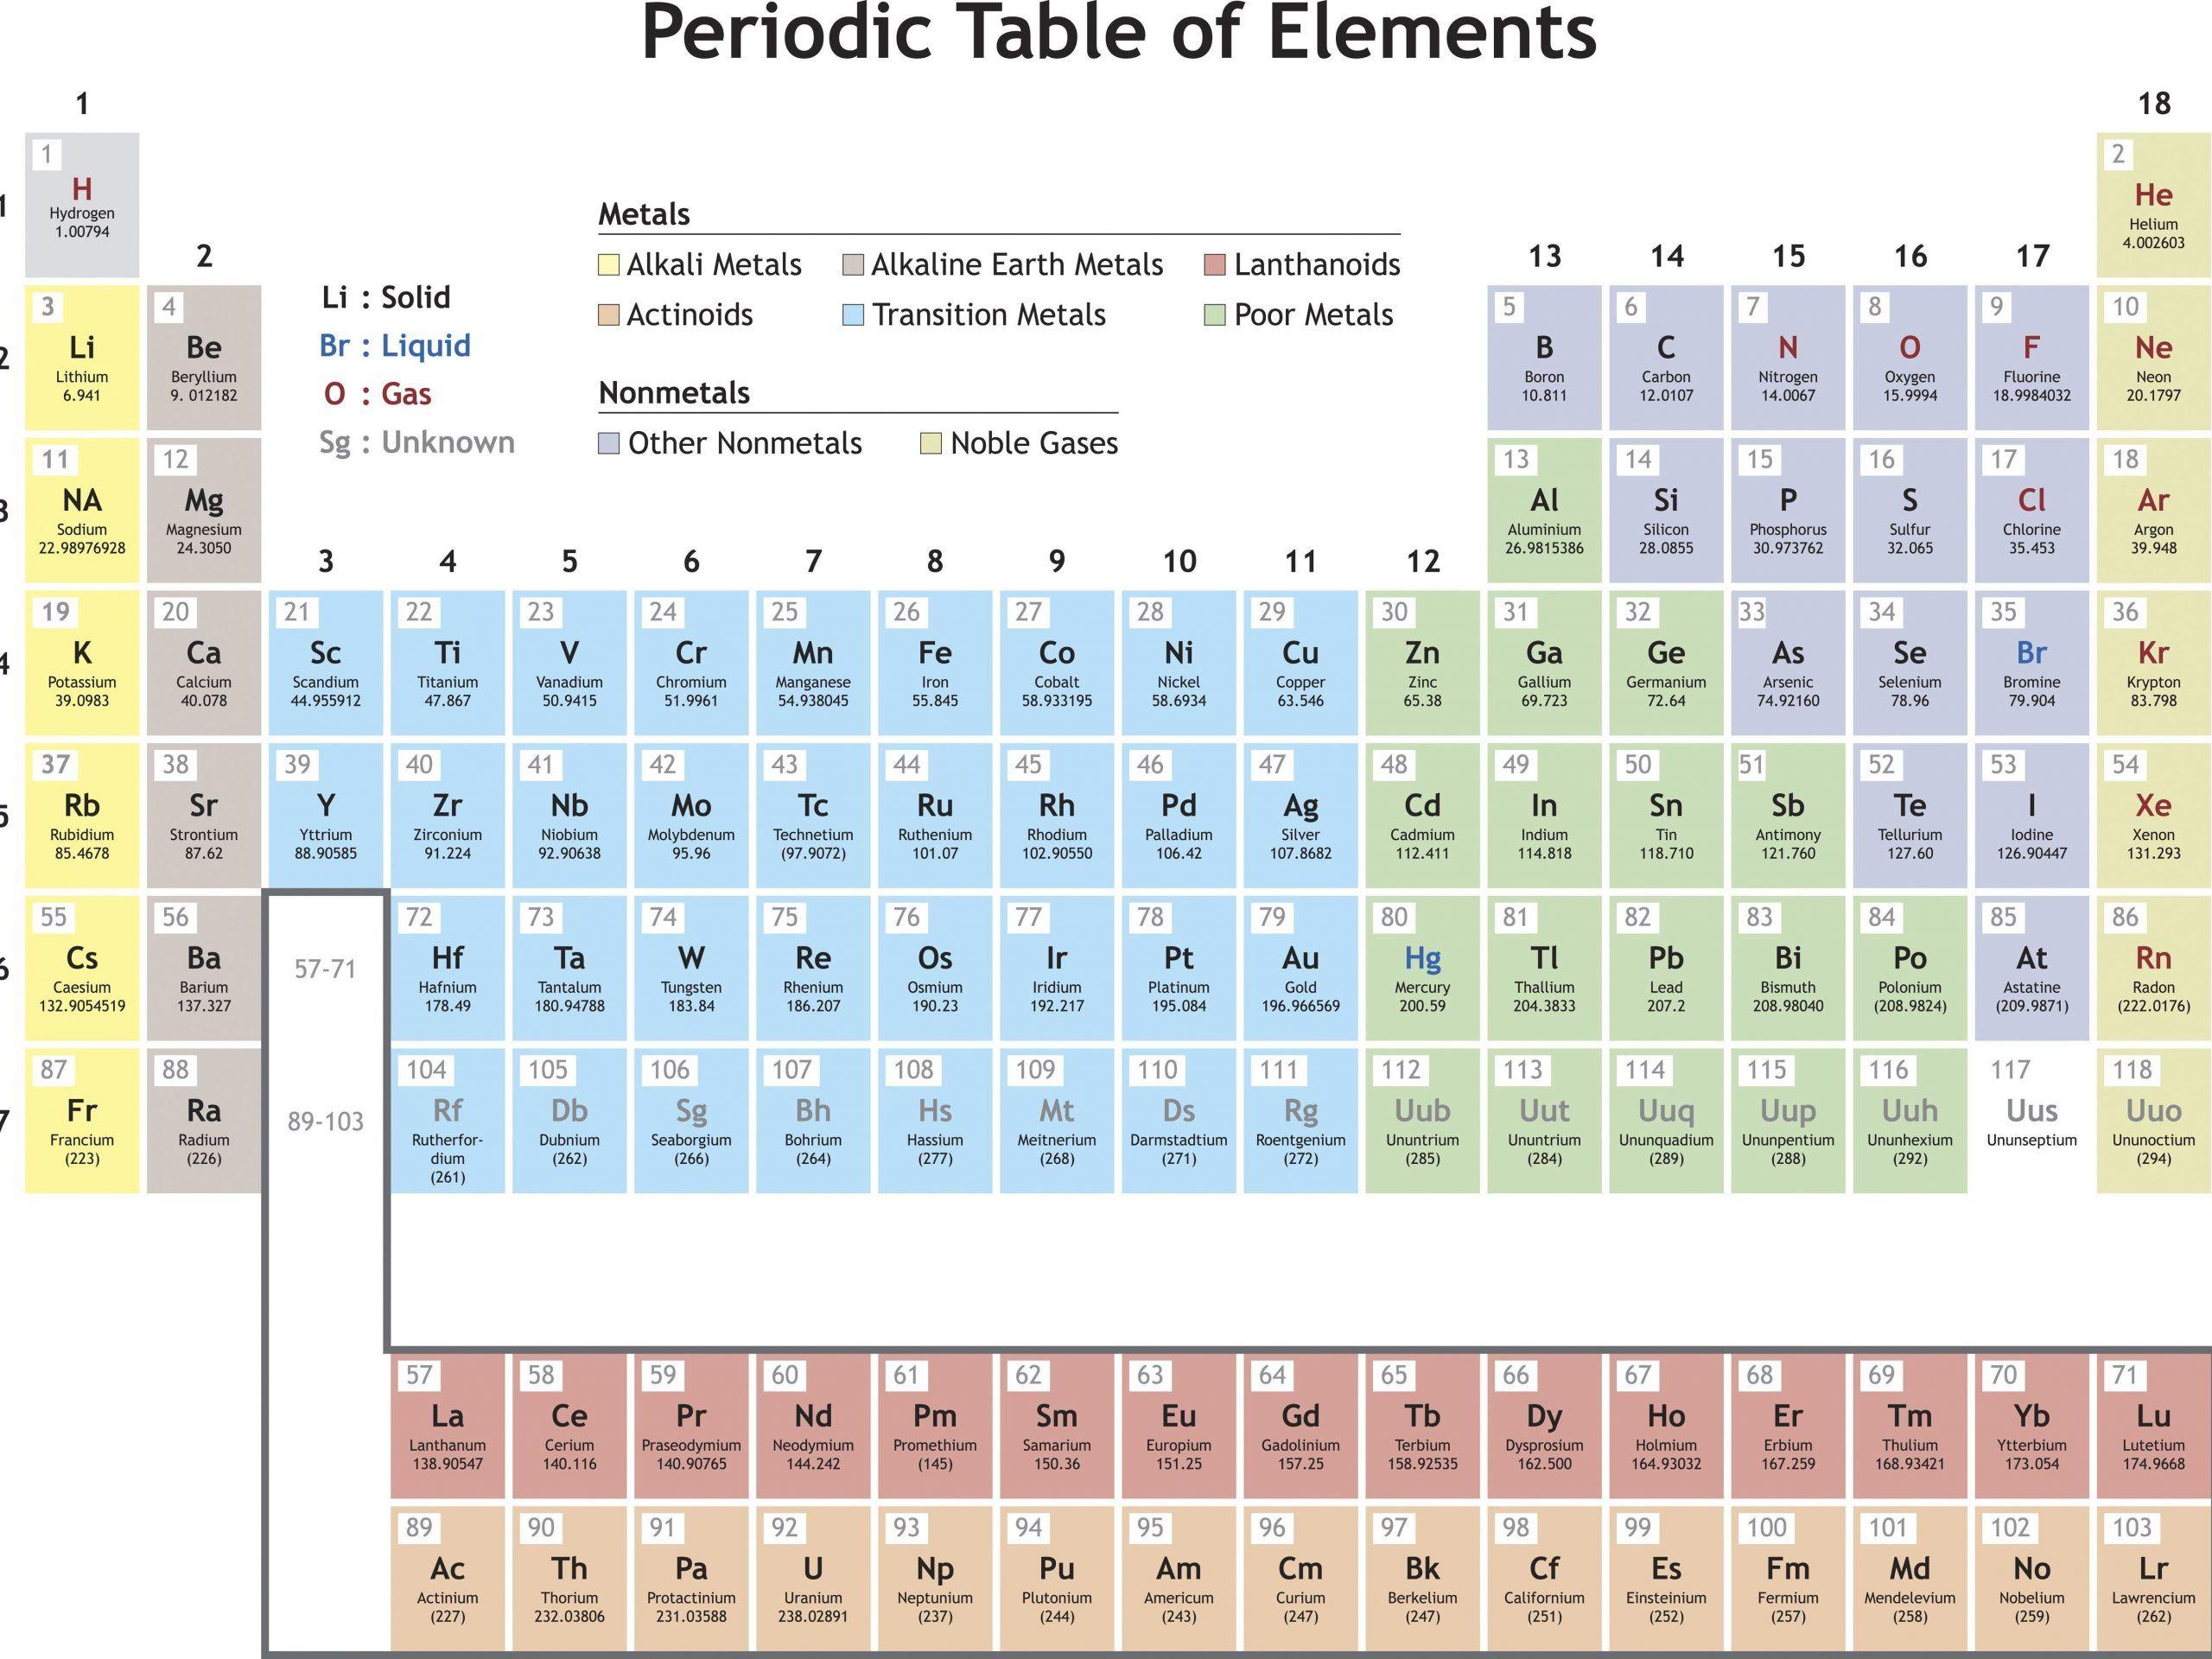 Mendeleev Periodic Table Worksheet In 2020 Periodic Table Geometry Worksheets Periodic Table Blocks [ 1920 x 2560 Pixel ]